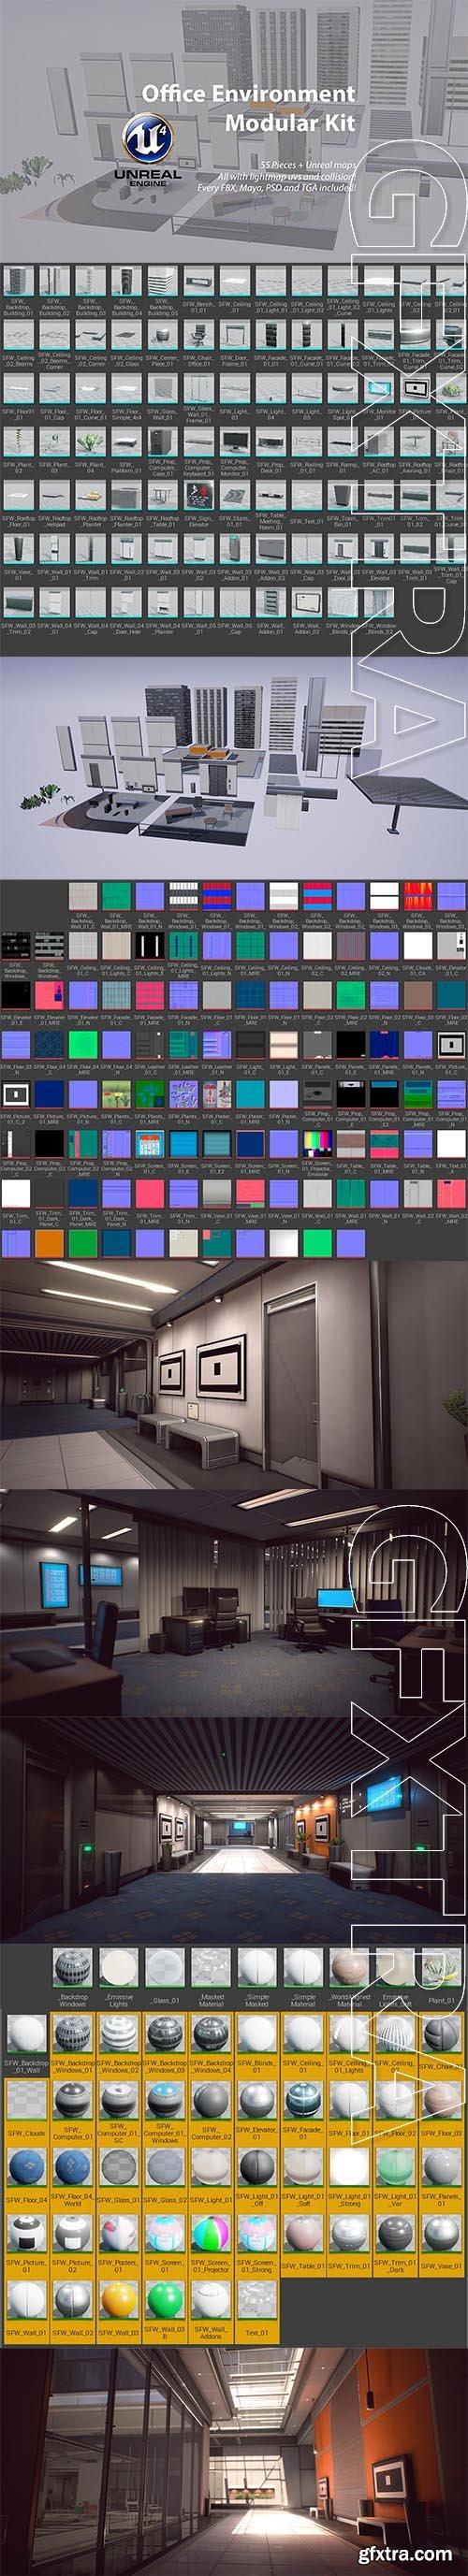 Cubebrush - Office Environment Modular Kit